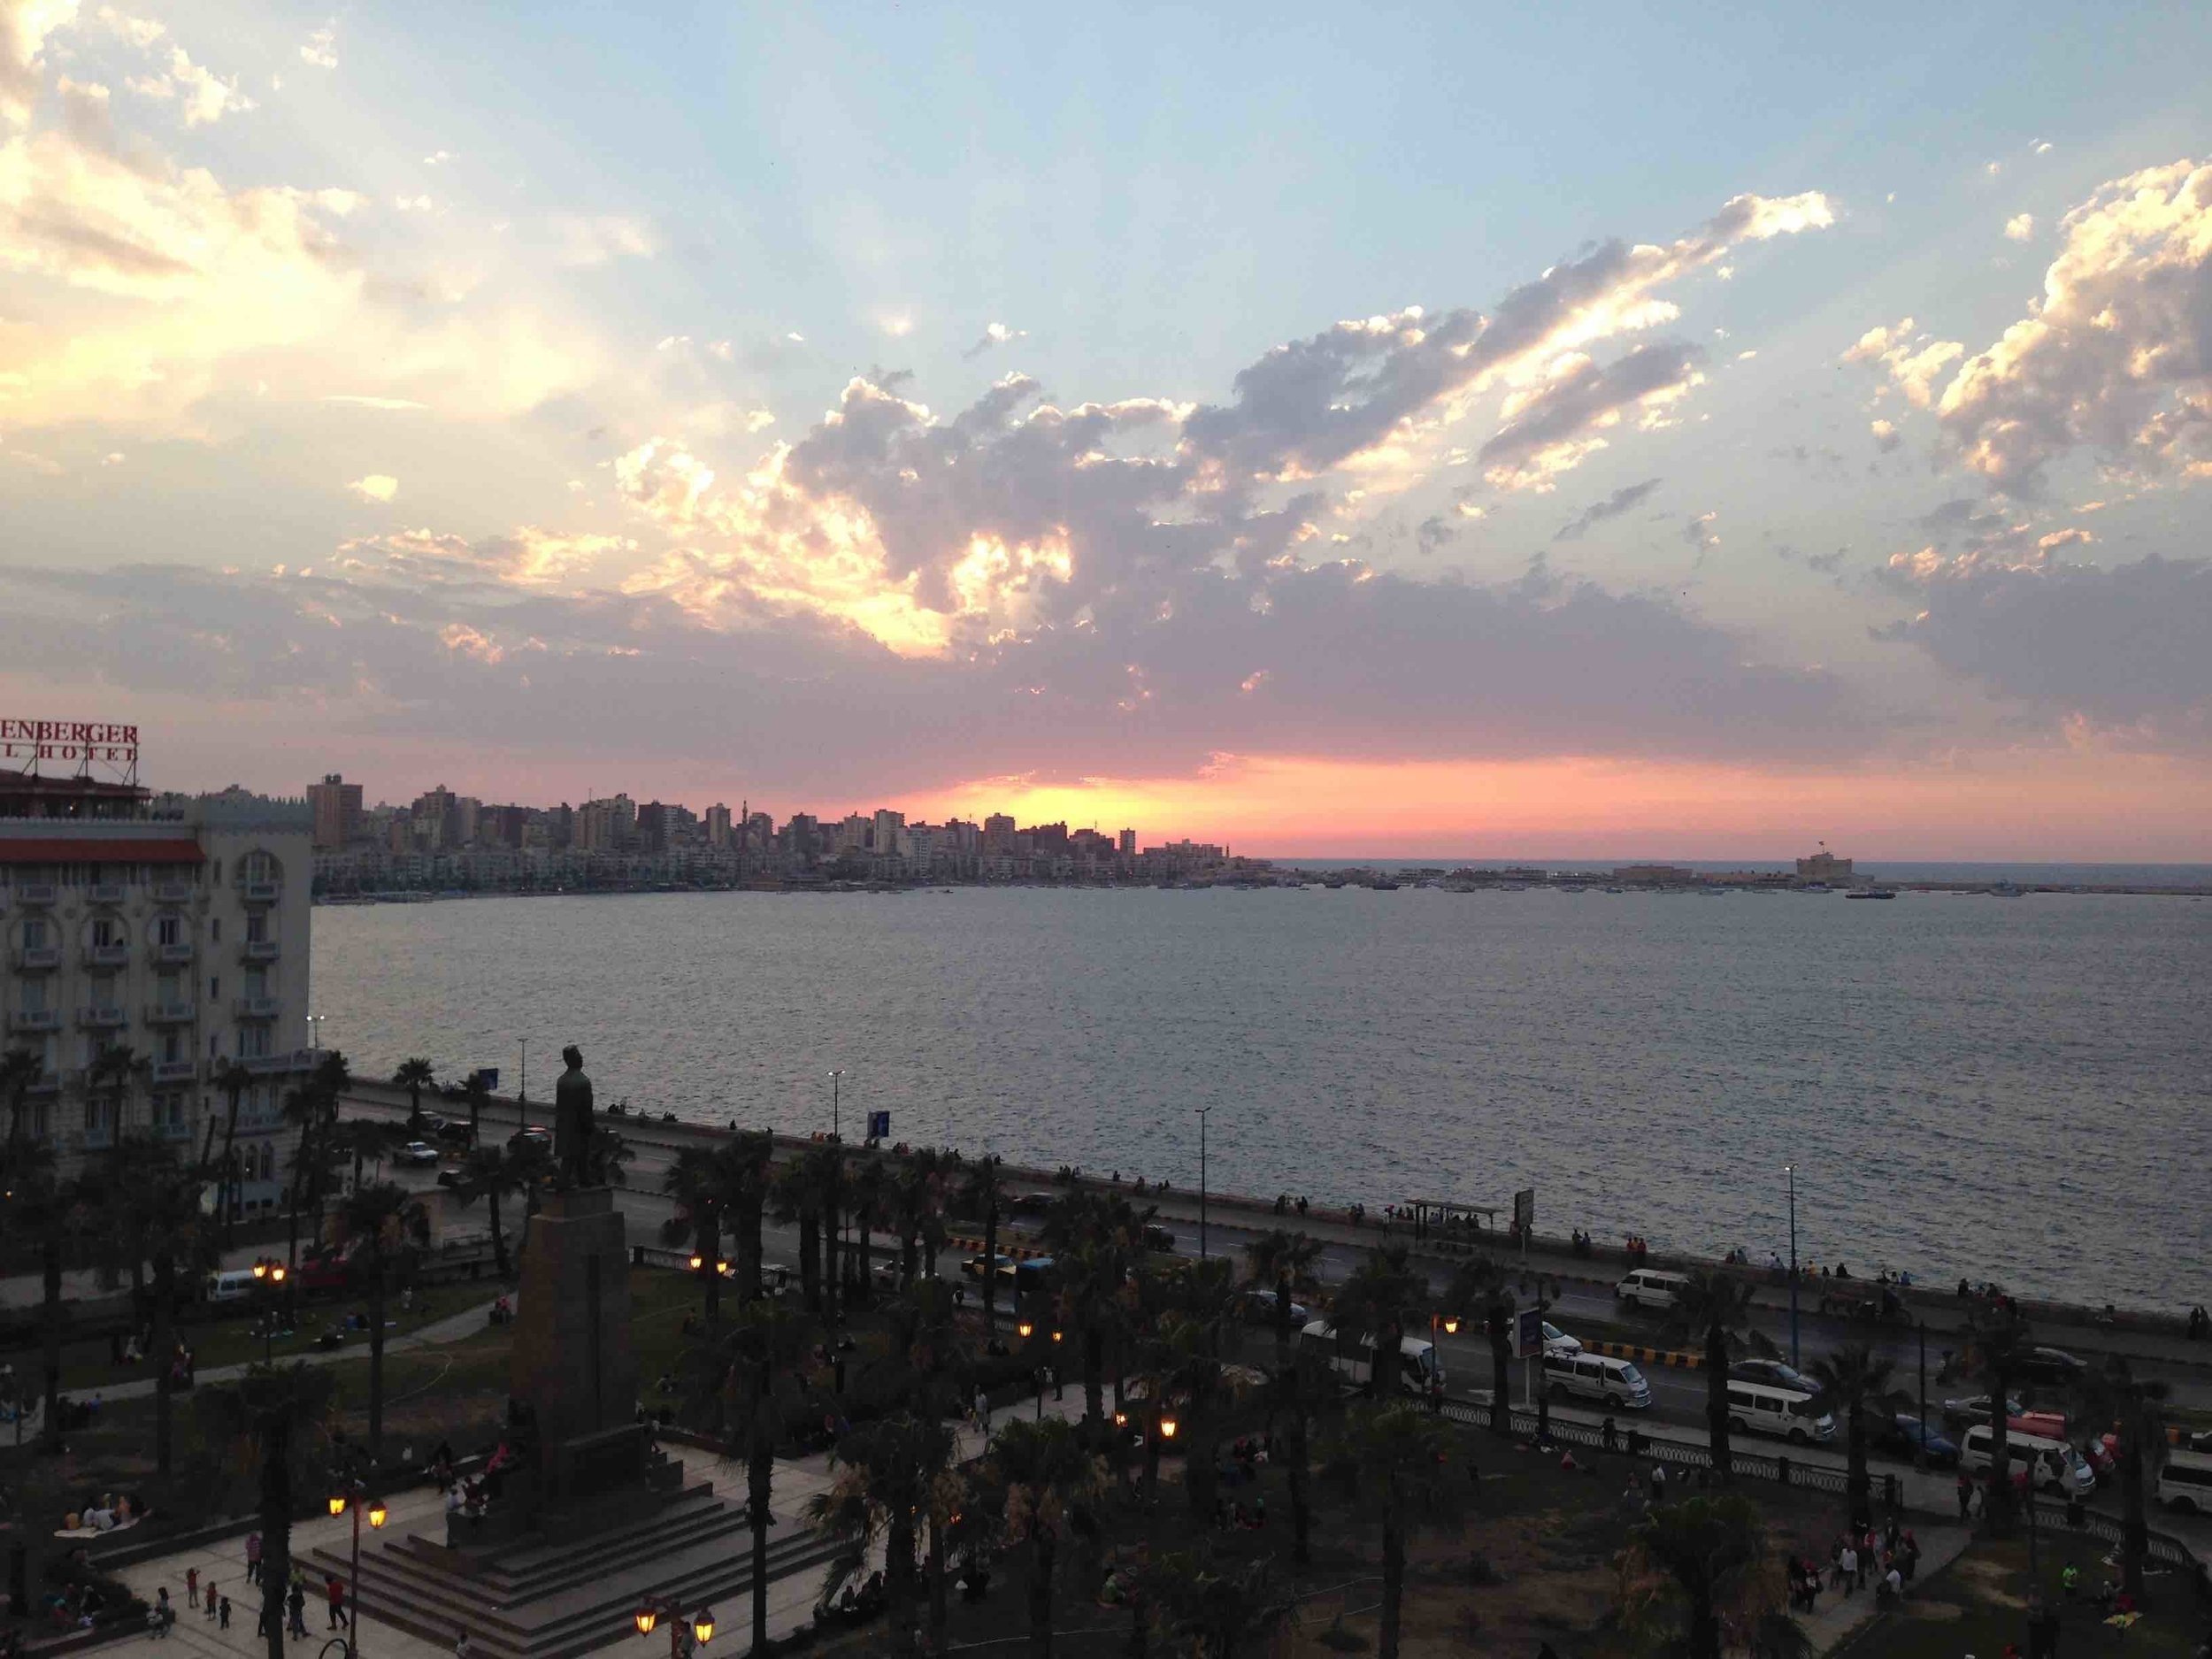 Dusk in the city of Alexandria